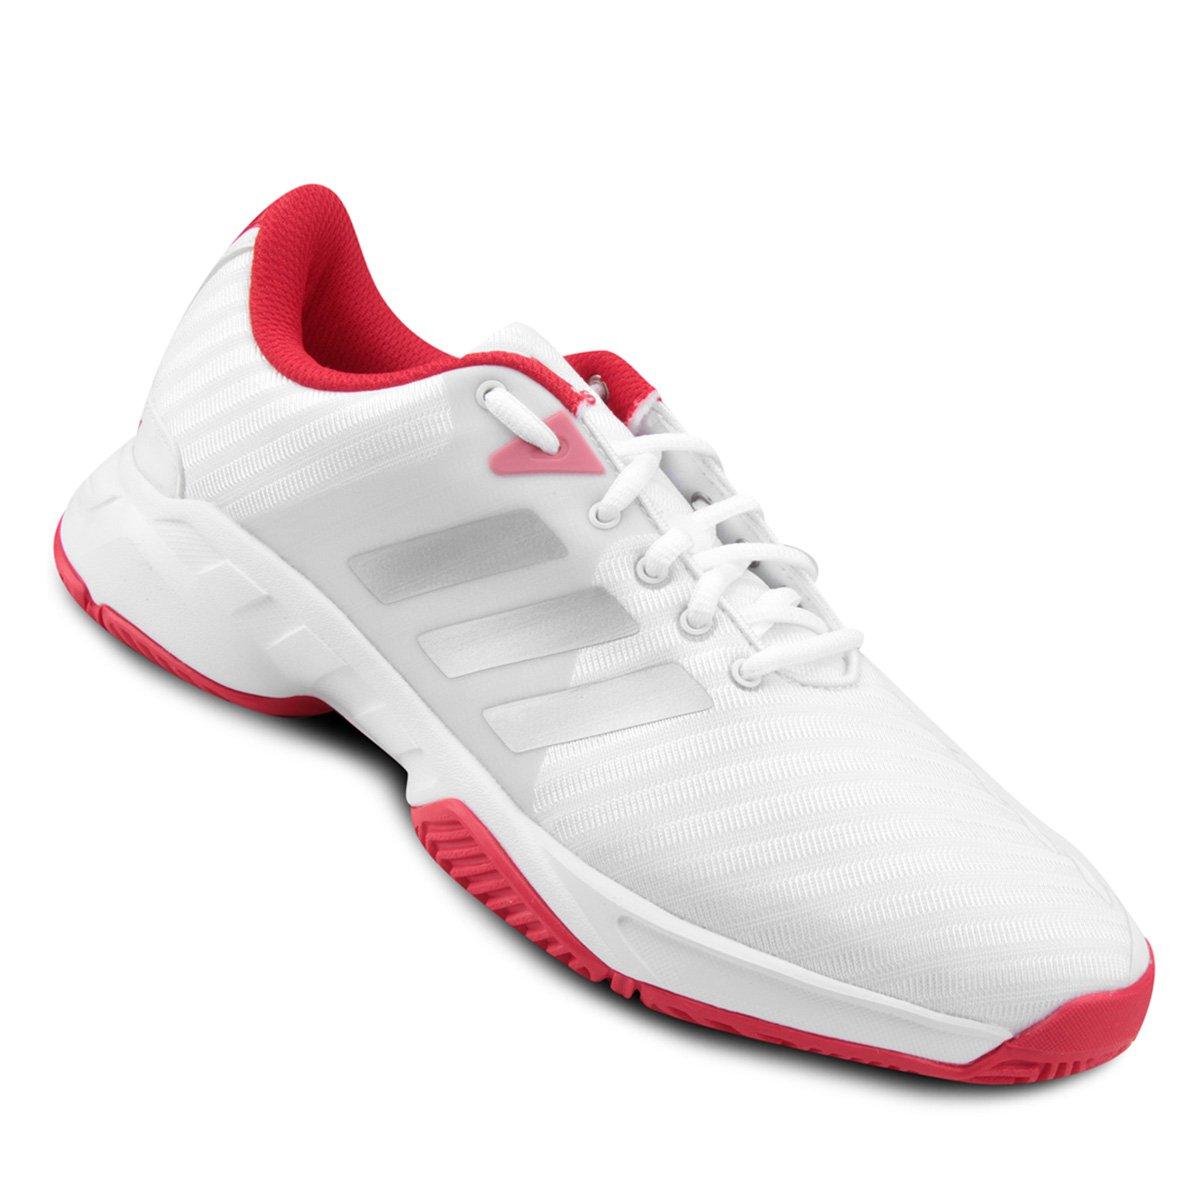 Tênis Adidas Barricade Court 3 Masculino - Compre Agora  1dbadfa4eeb8c